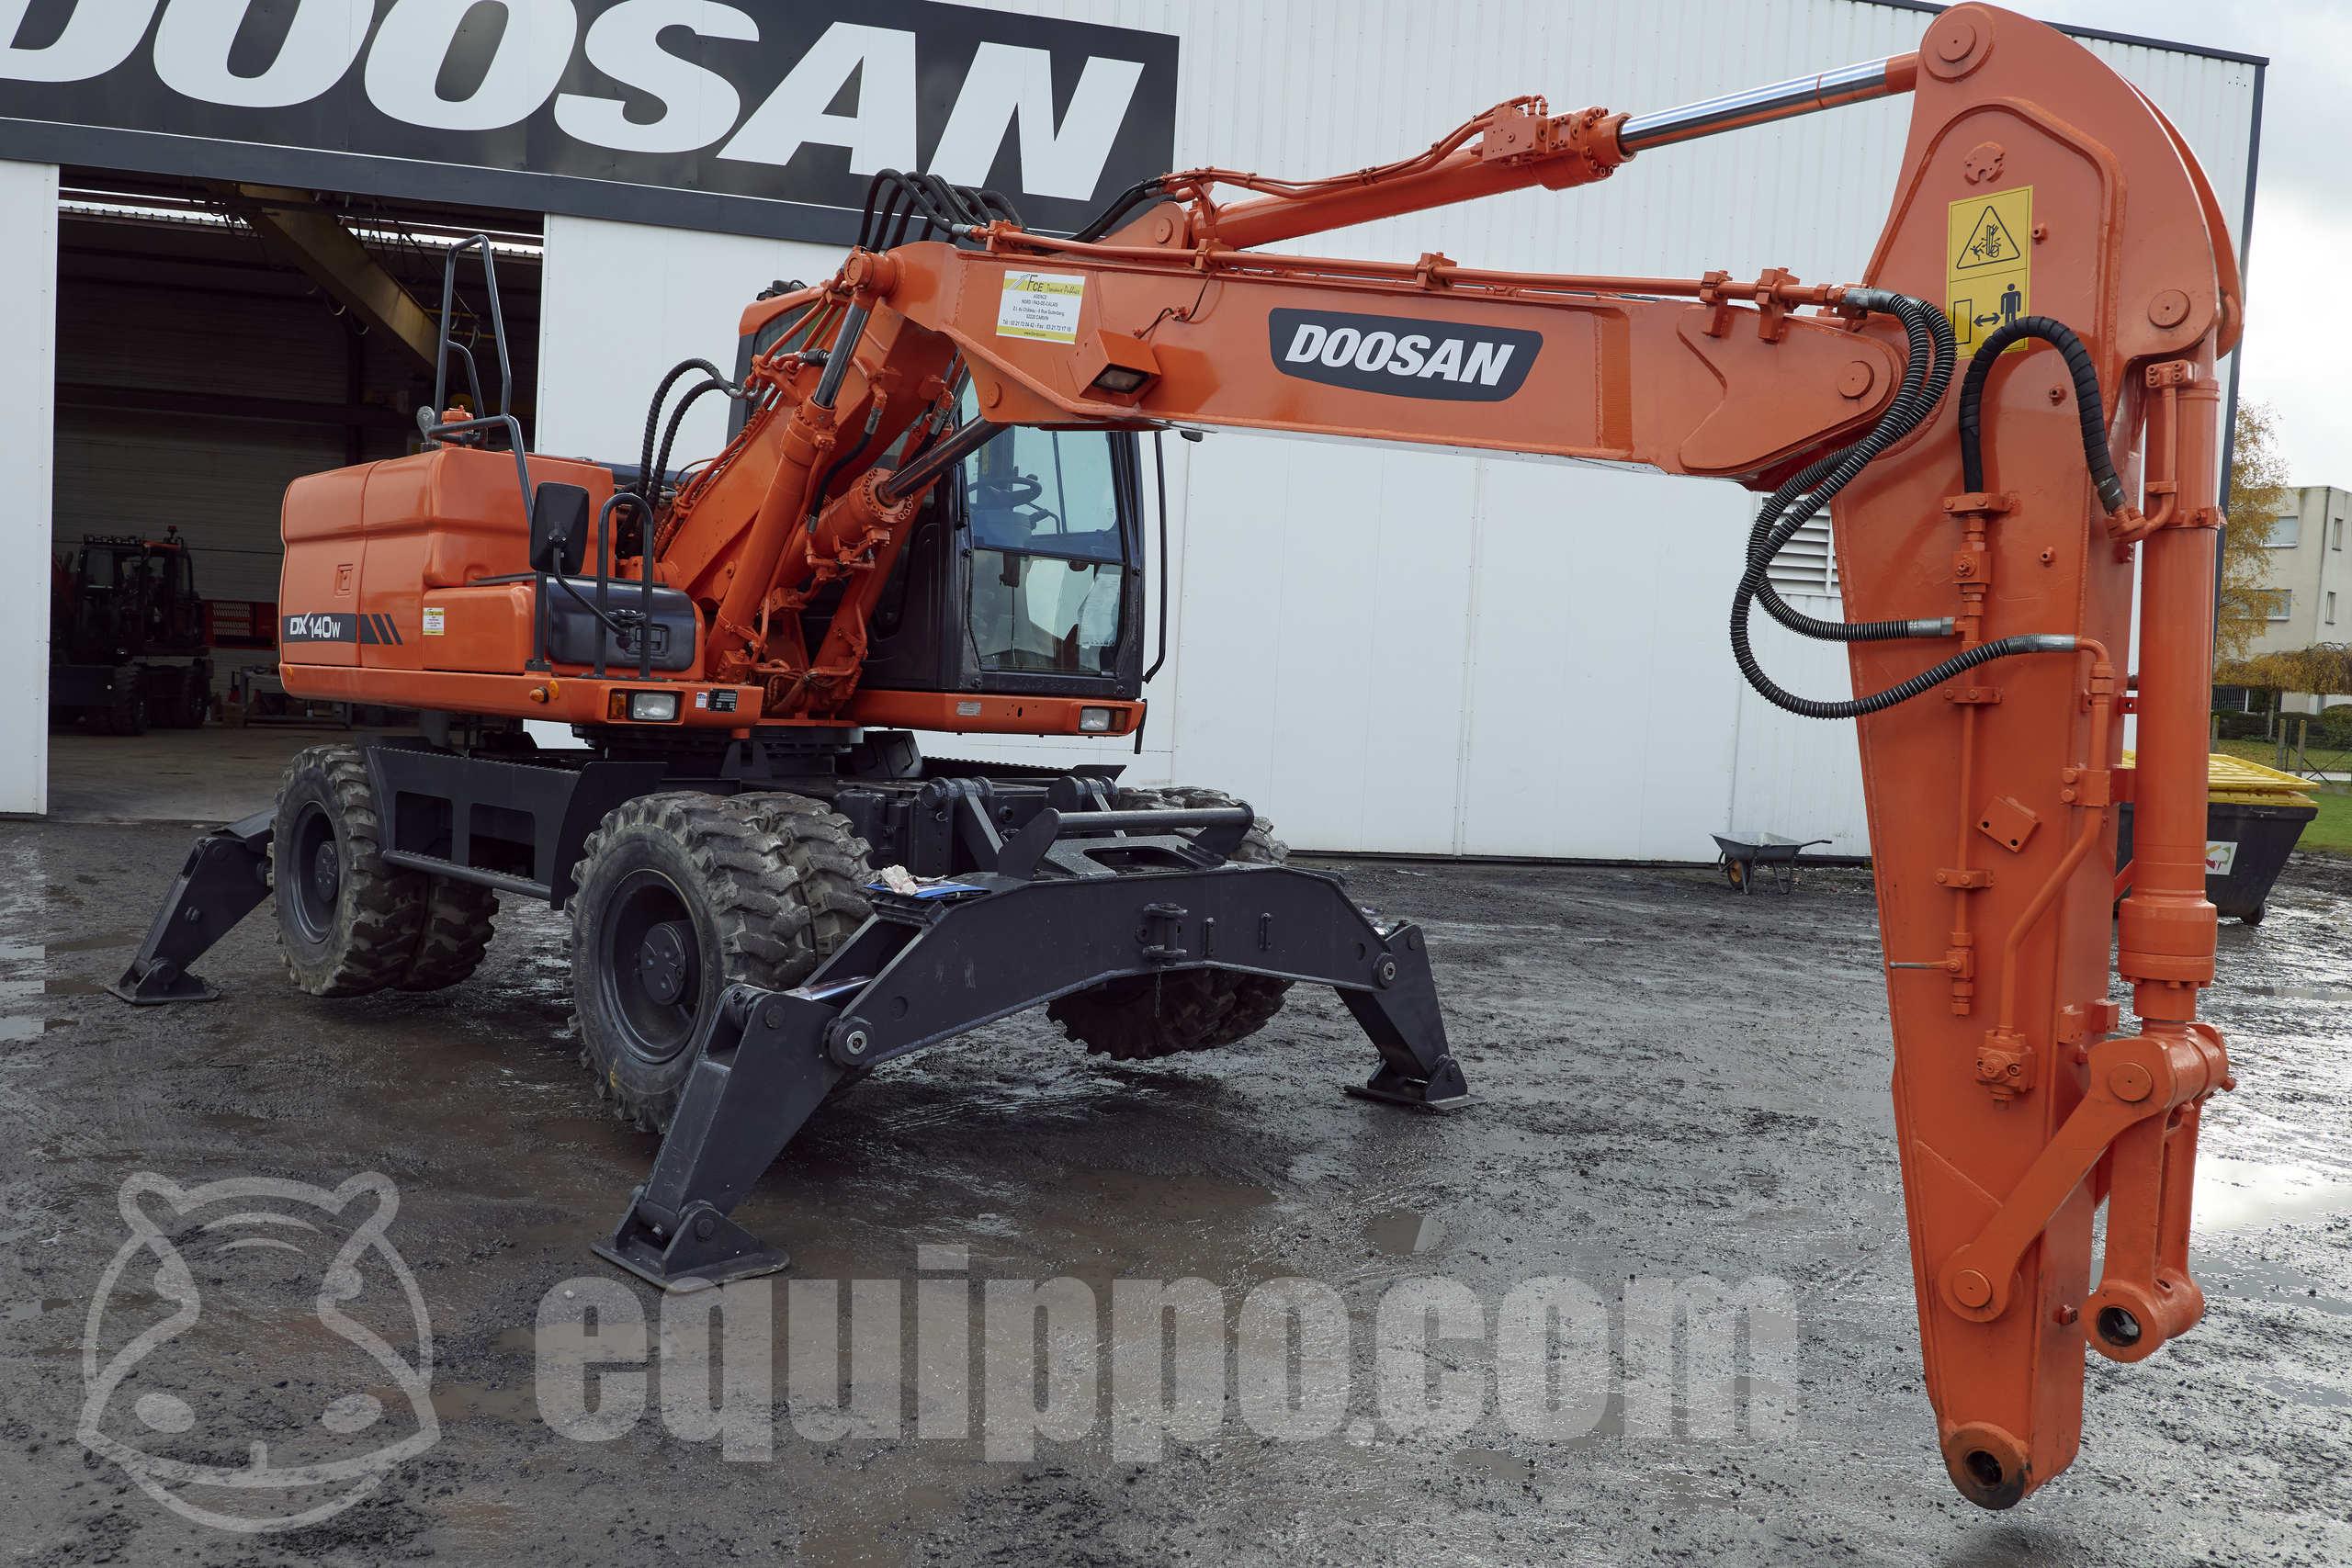 2013 - Doosan DX140W